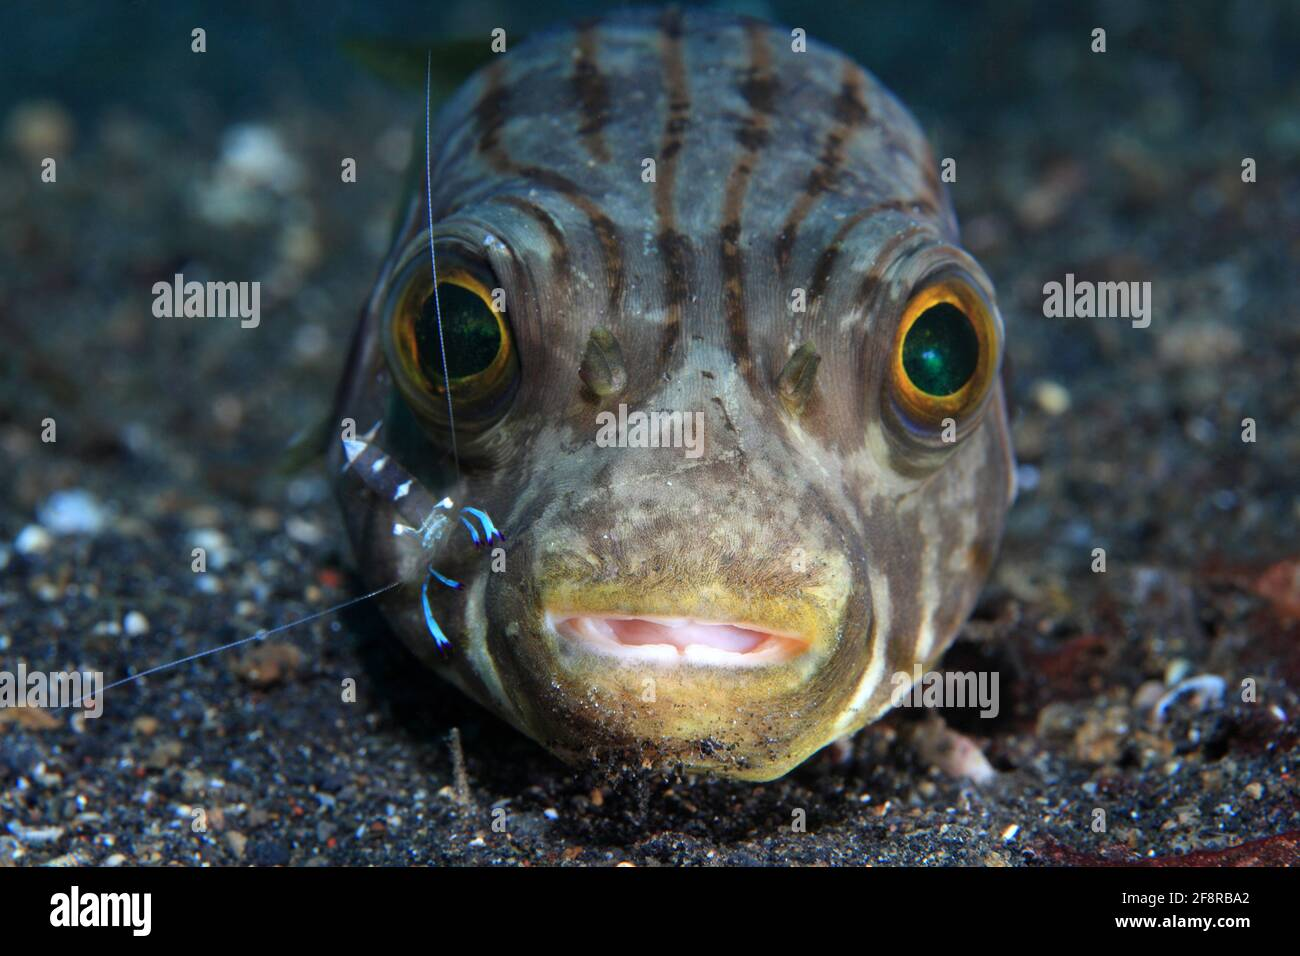 Manila-Kugelfisch, Narrow-lined puffer, Lembeh, Sulawesi, Indonesia Stock Photo